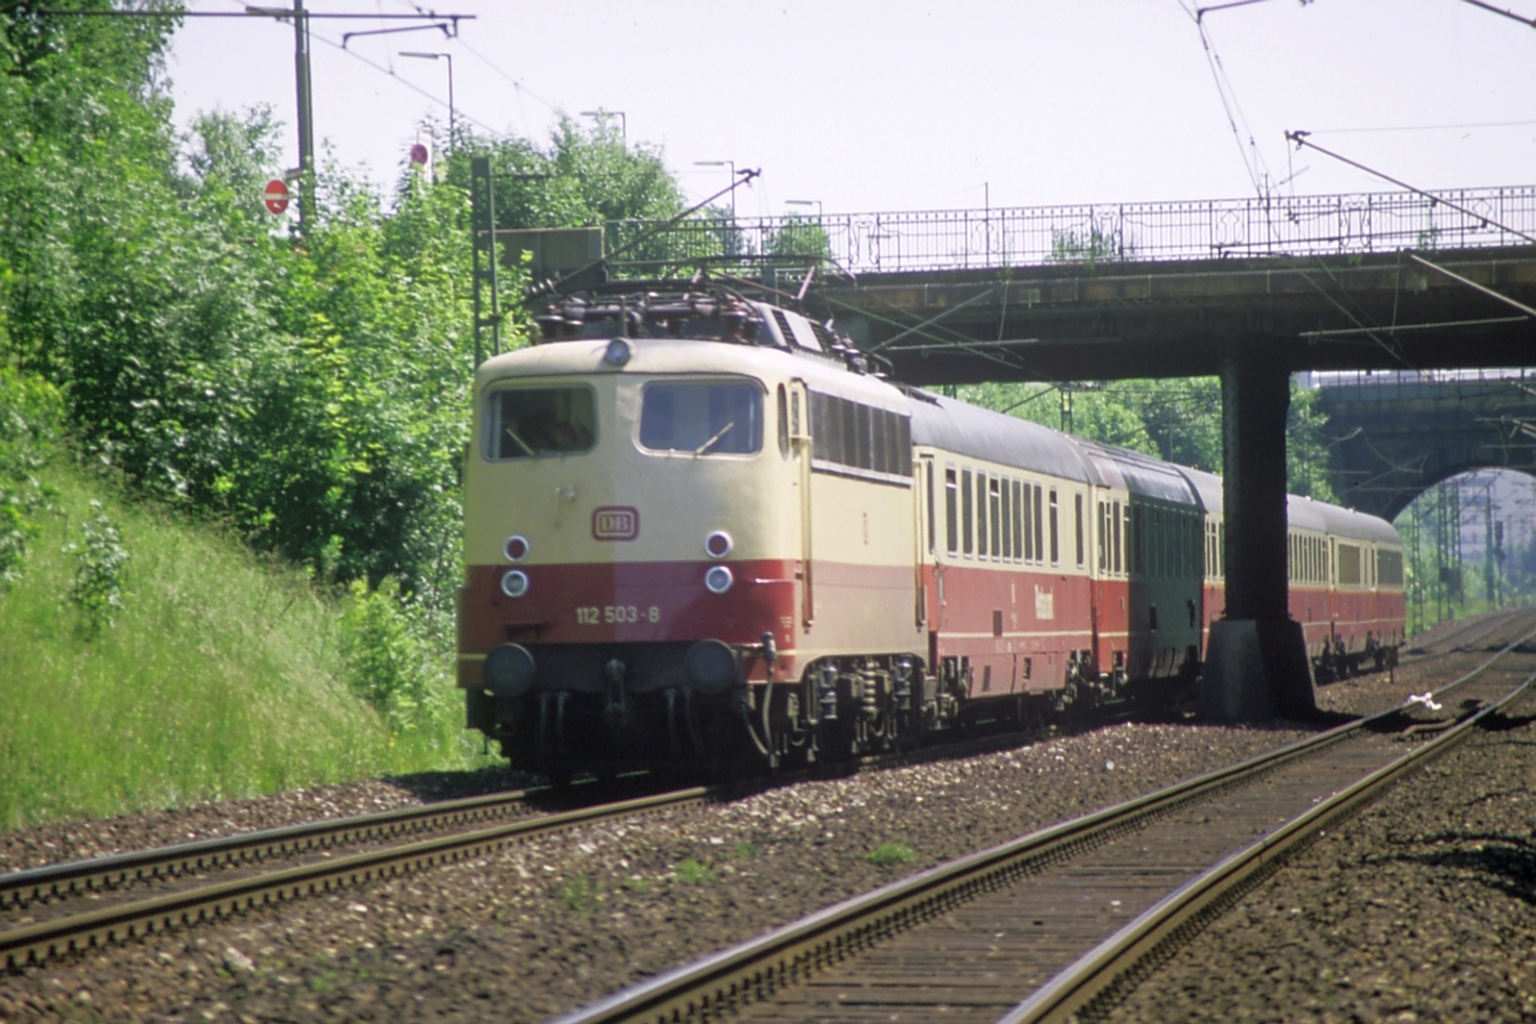 About: ラインゴルト (列車)